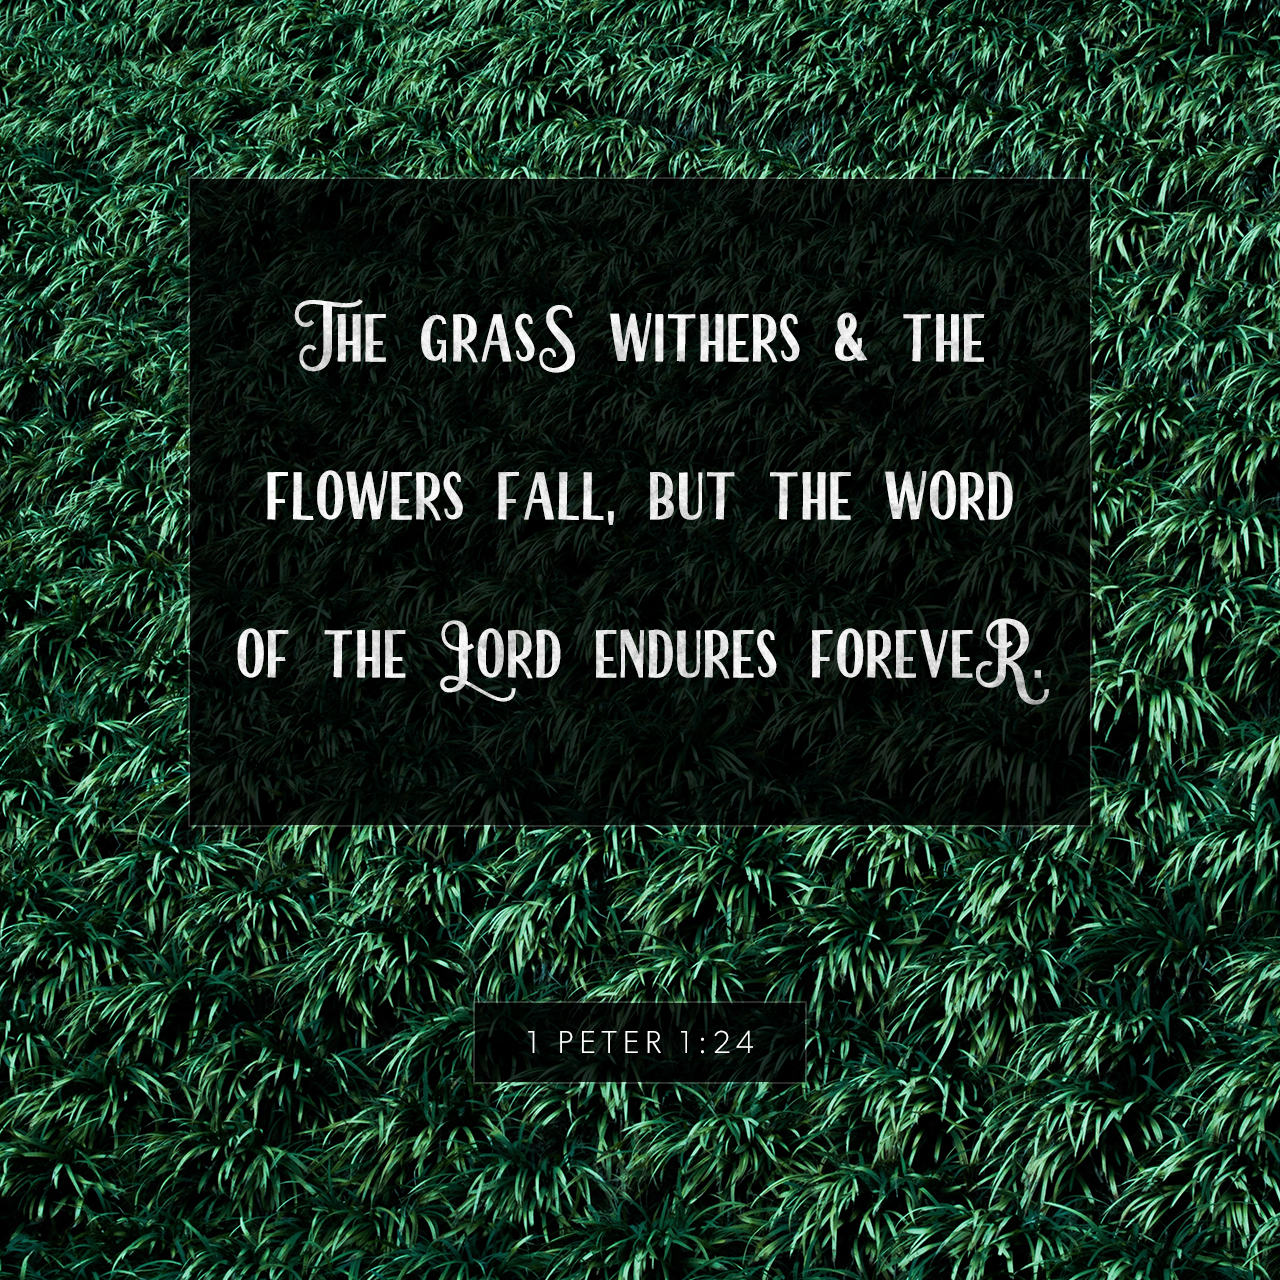 1 Peter 1:24